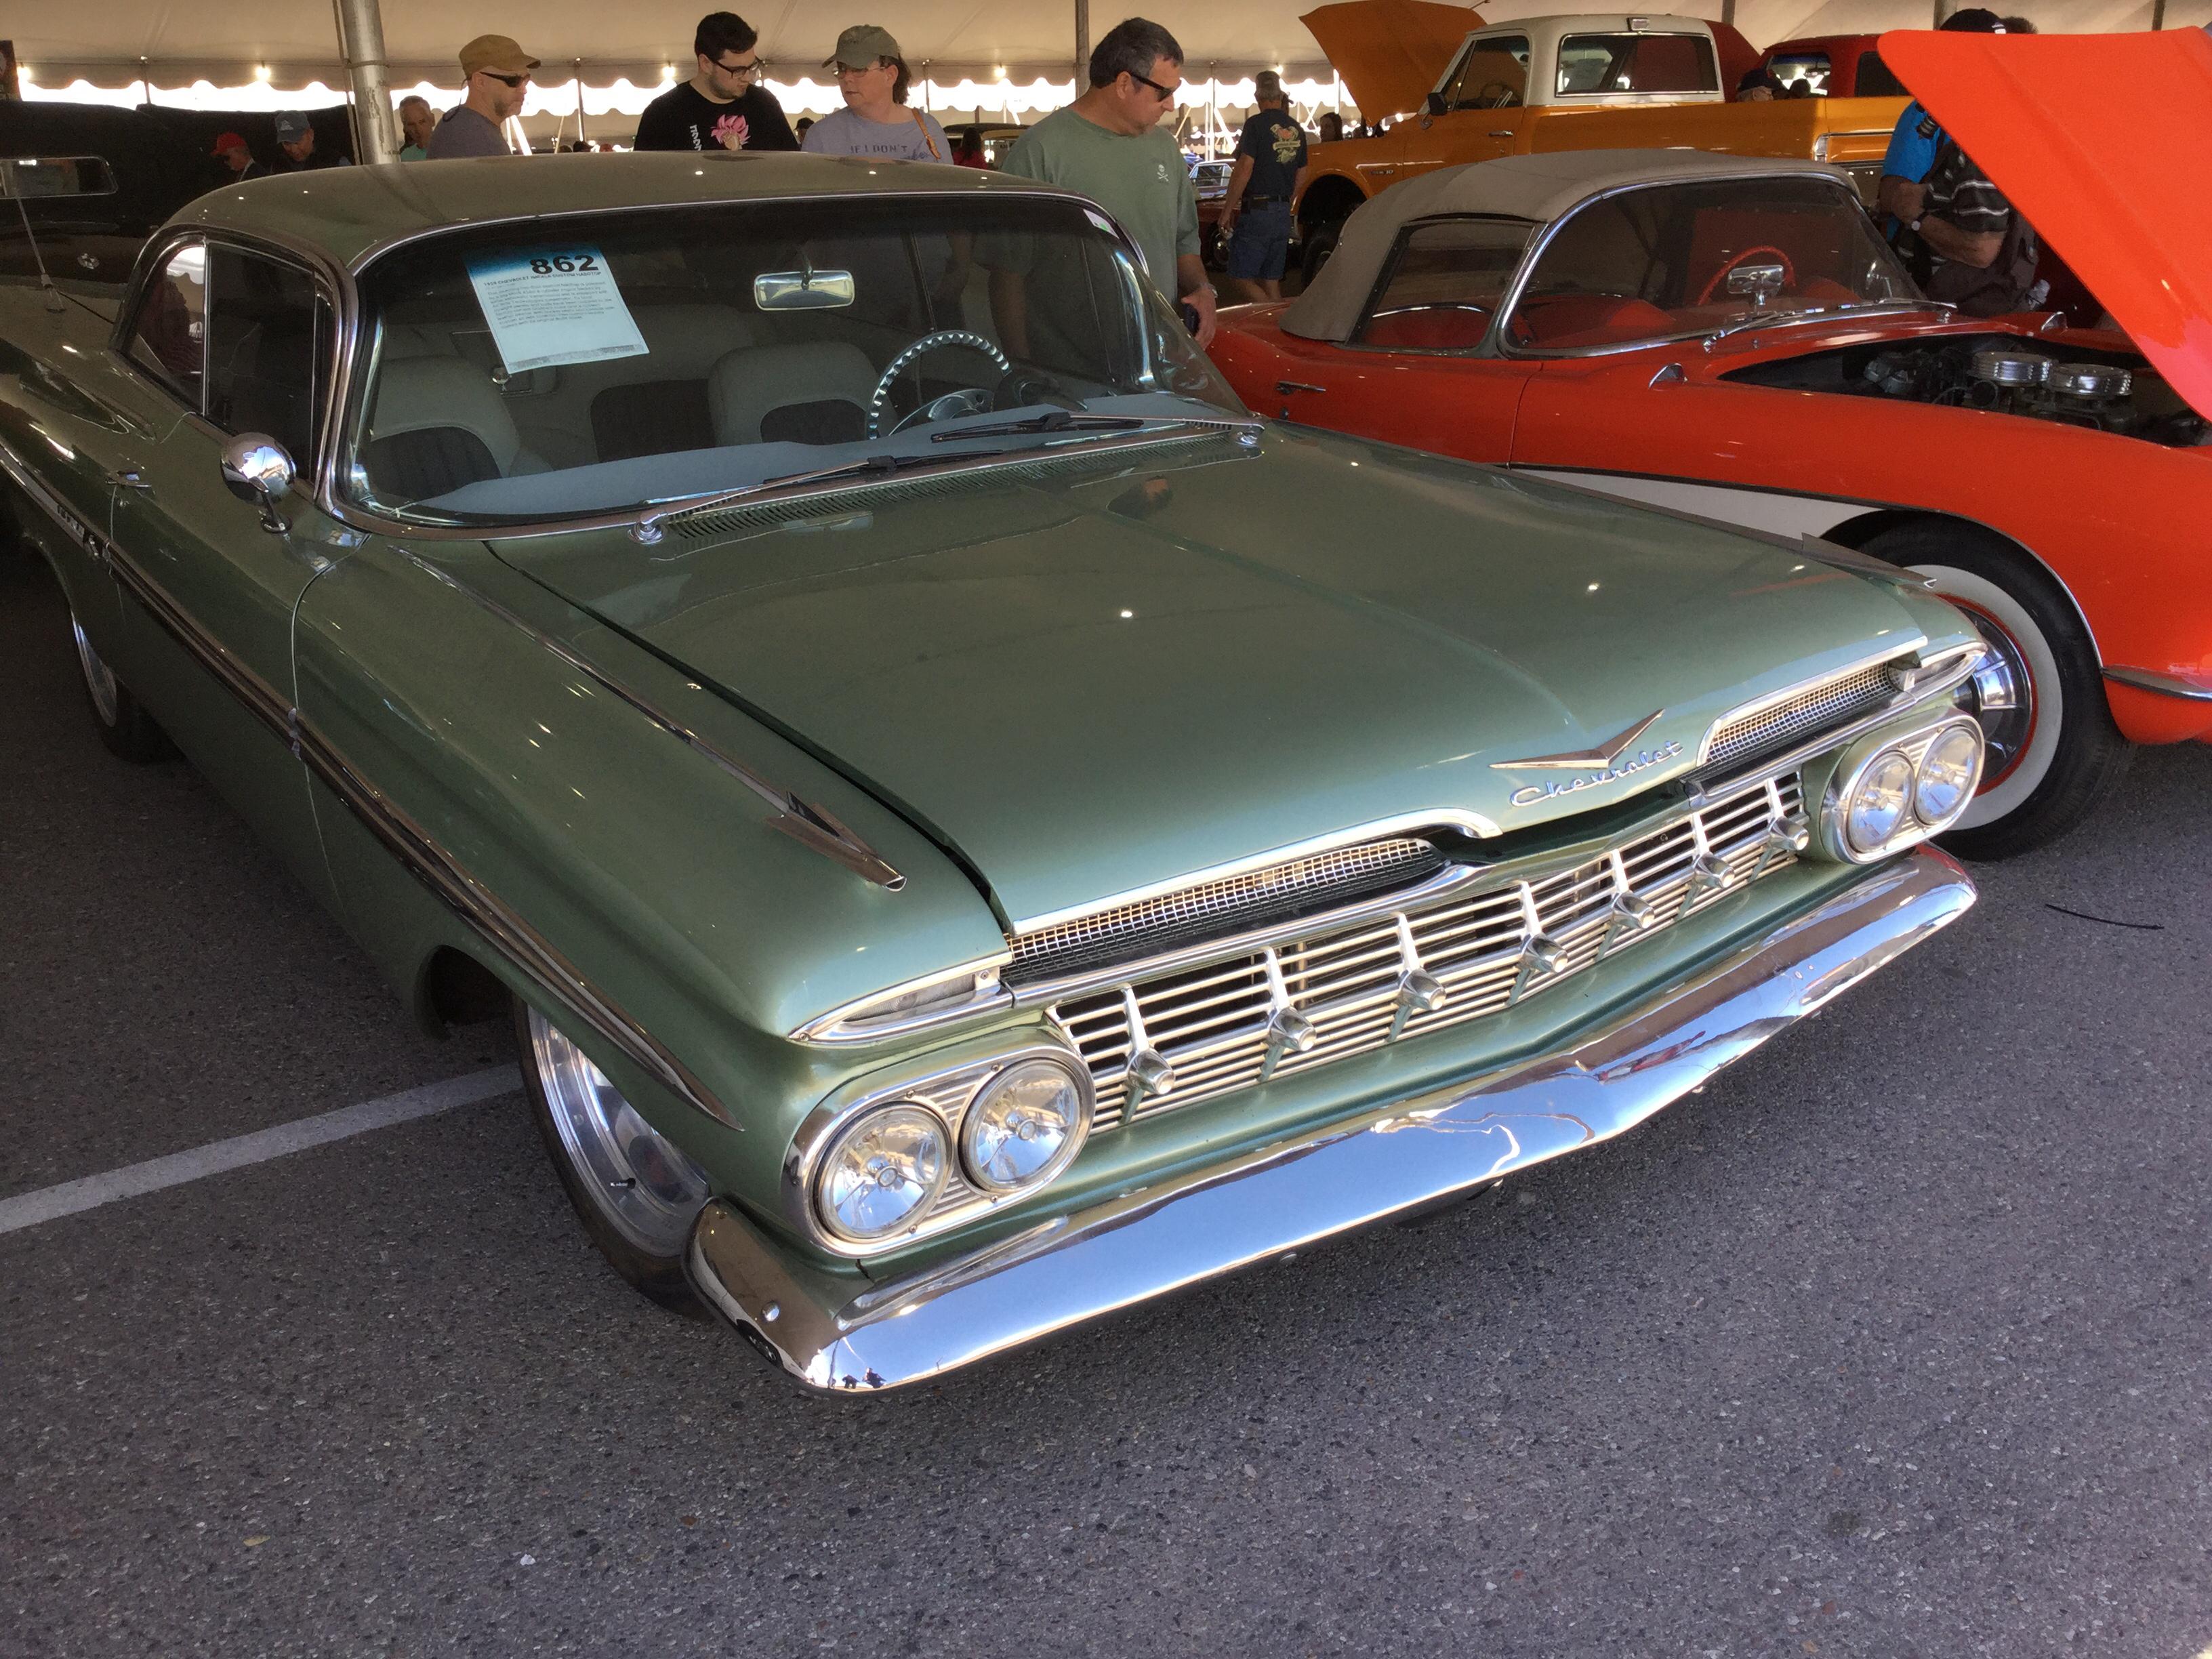 Barrett JacksonScottsdale2018_862_Chevrolet_1959_Impala_Base_Sport Coupe_F59F177498_Exterior 1959 chevrolet impala values hagerty valuation tool®